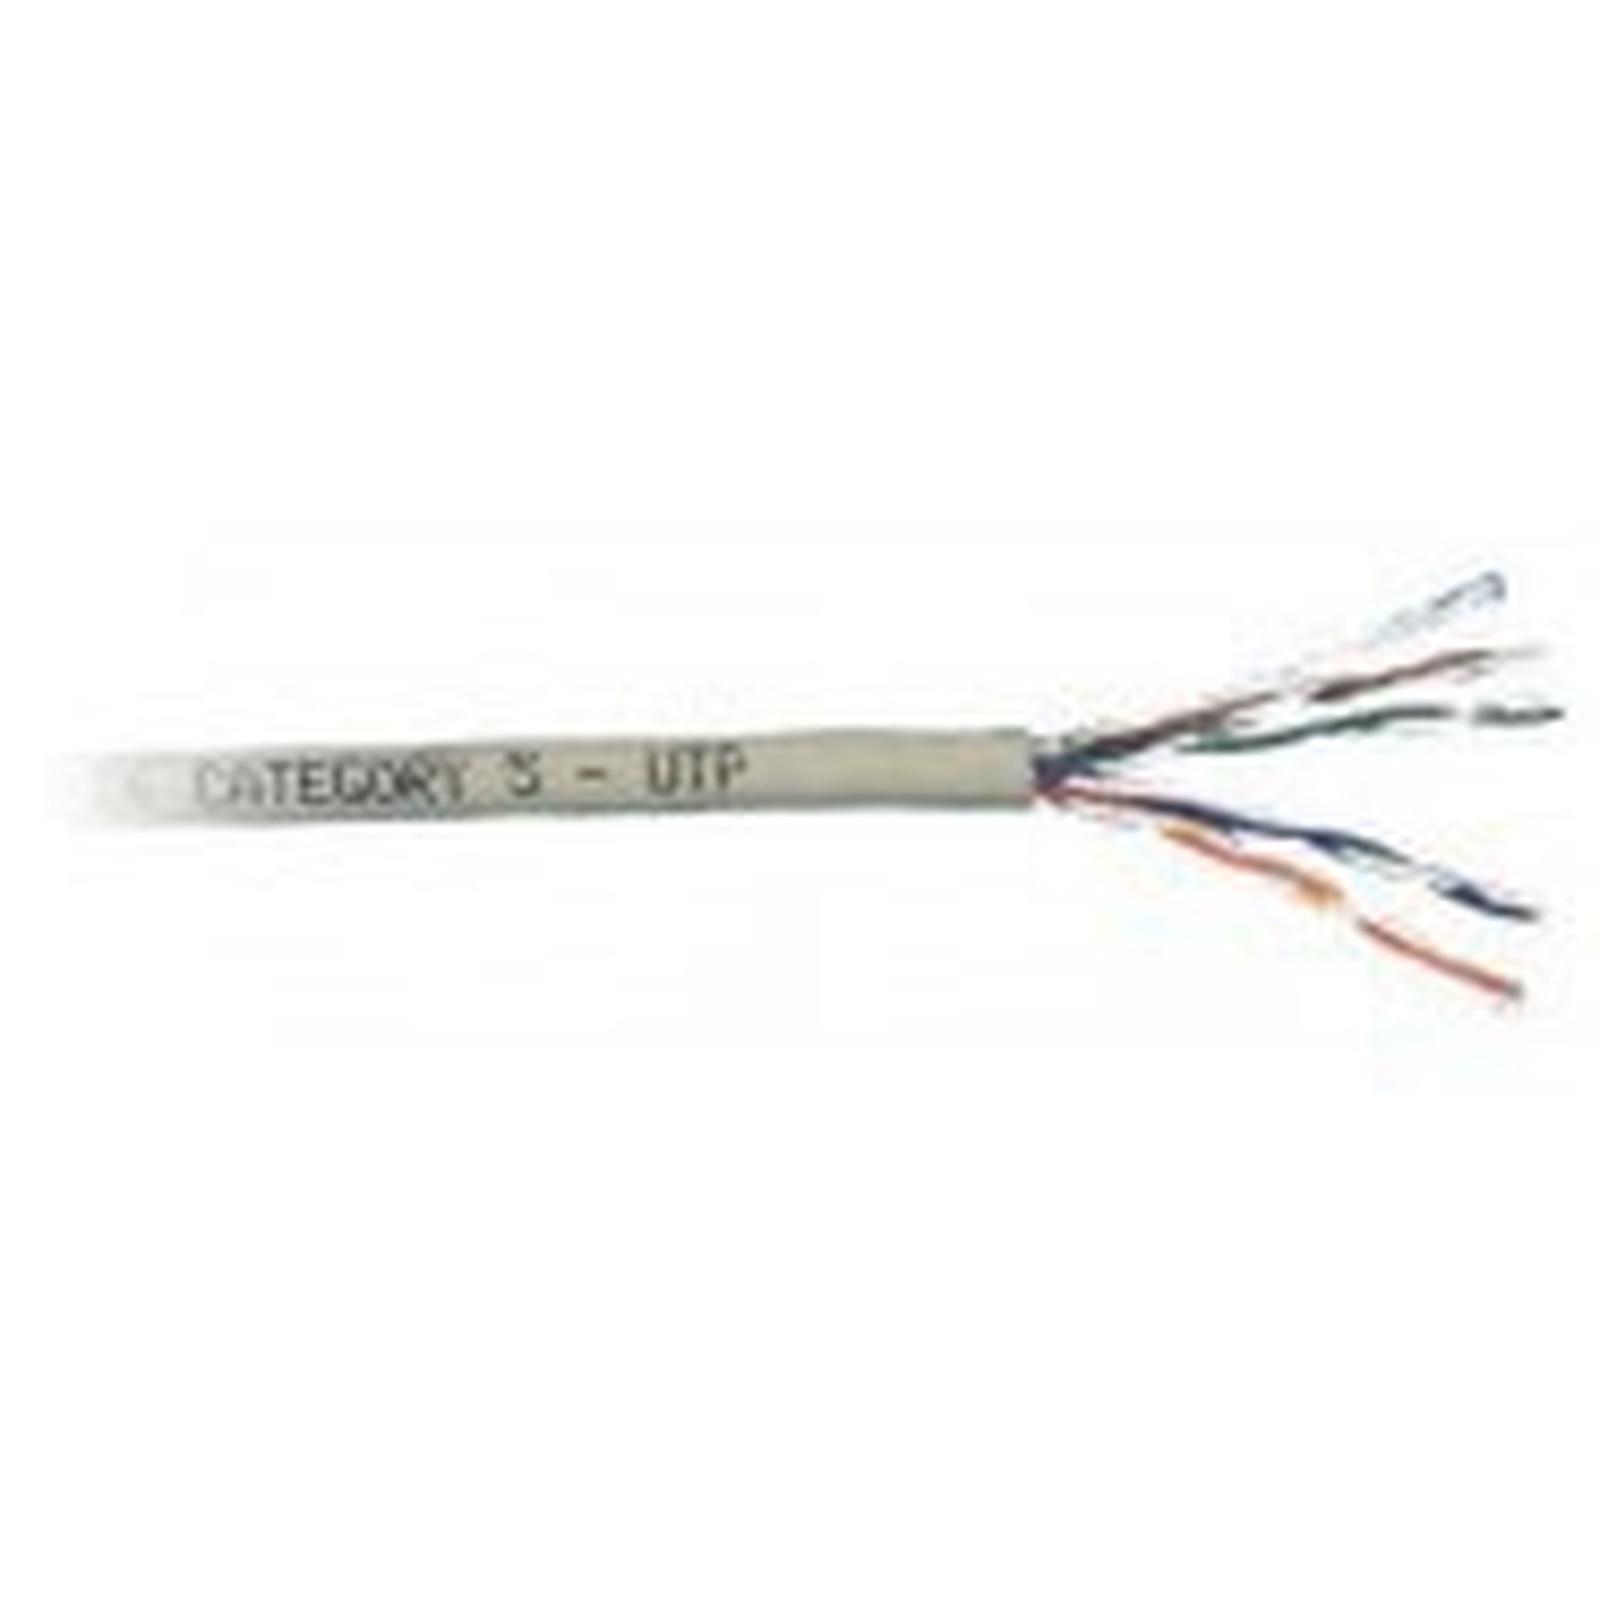 Câble Multibrin RJ45 catégorie 5e UTP 1000 mètres